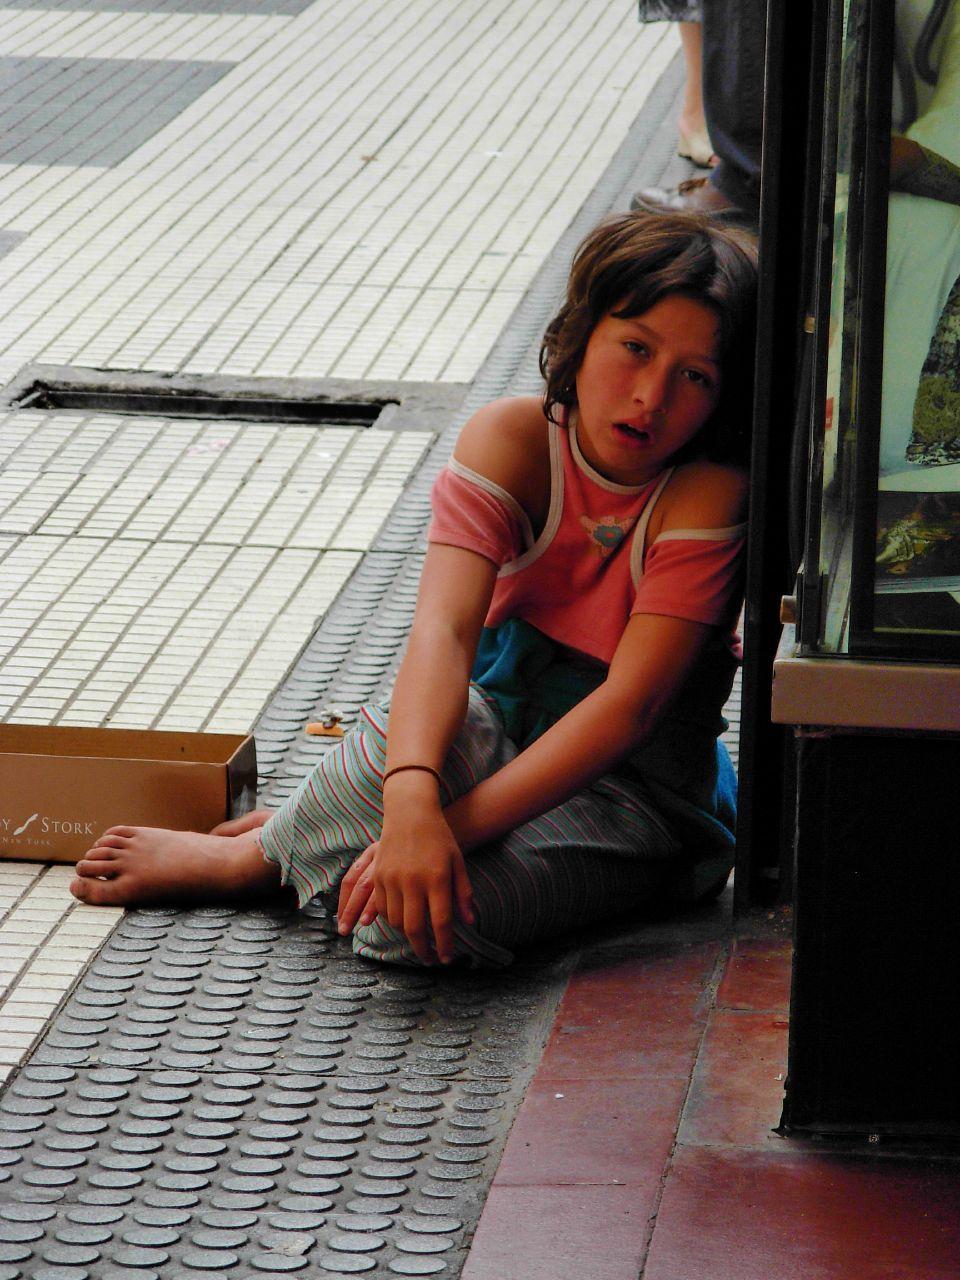 http://4.bp.blogspot.com/-WHyFGp9Jde4/T6-hU2EexMI/AAAAAAAABeI/UBq4fUls9S4/s1600/argentina+6.jpg